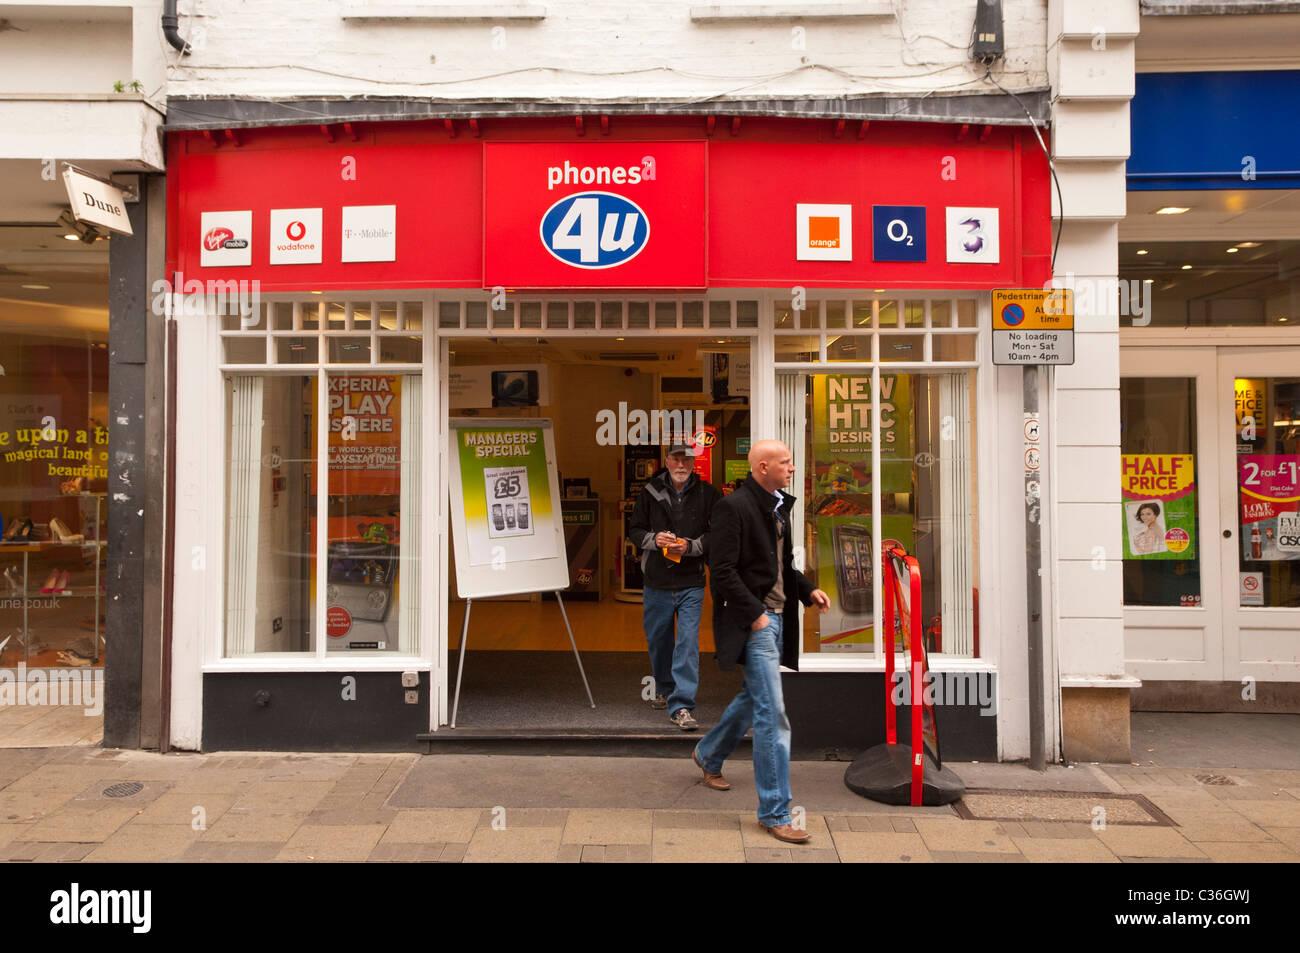 Mobile Phones Store Stockfotos & Mobile Phones Store Bilder - Alamy